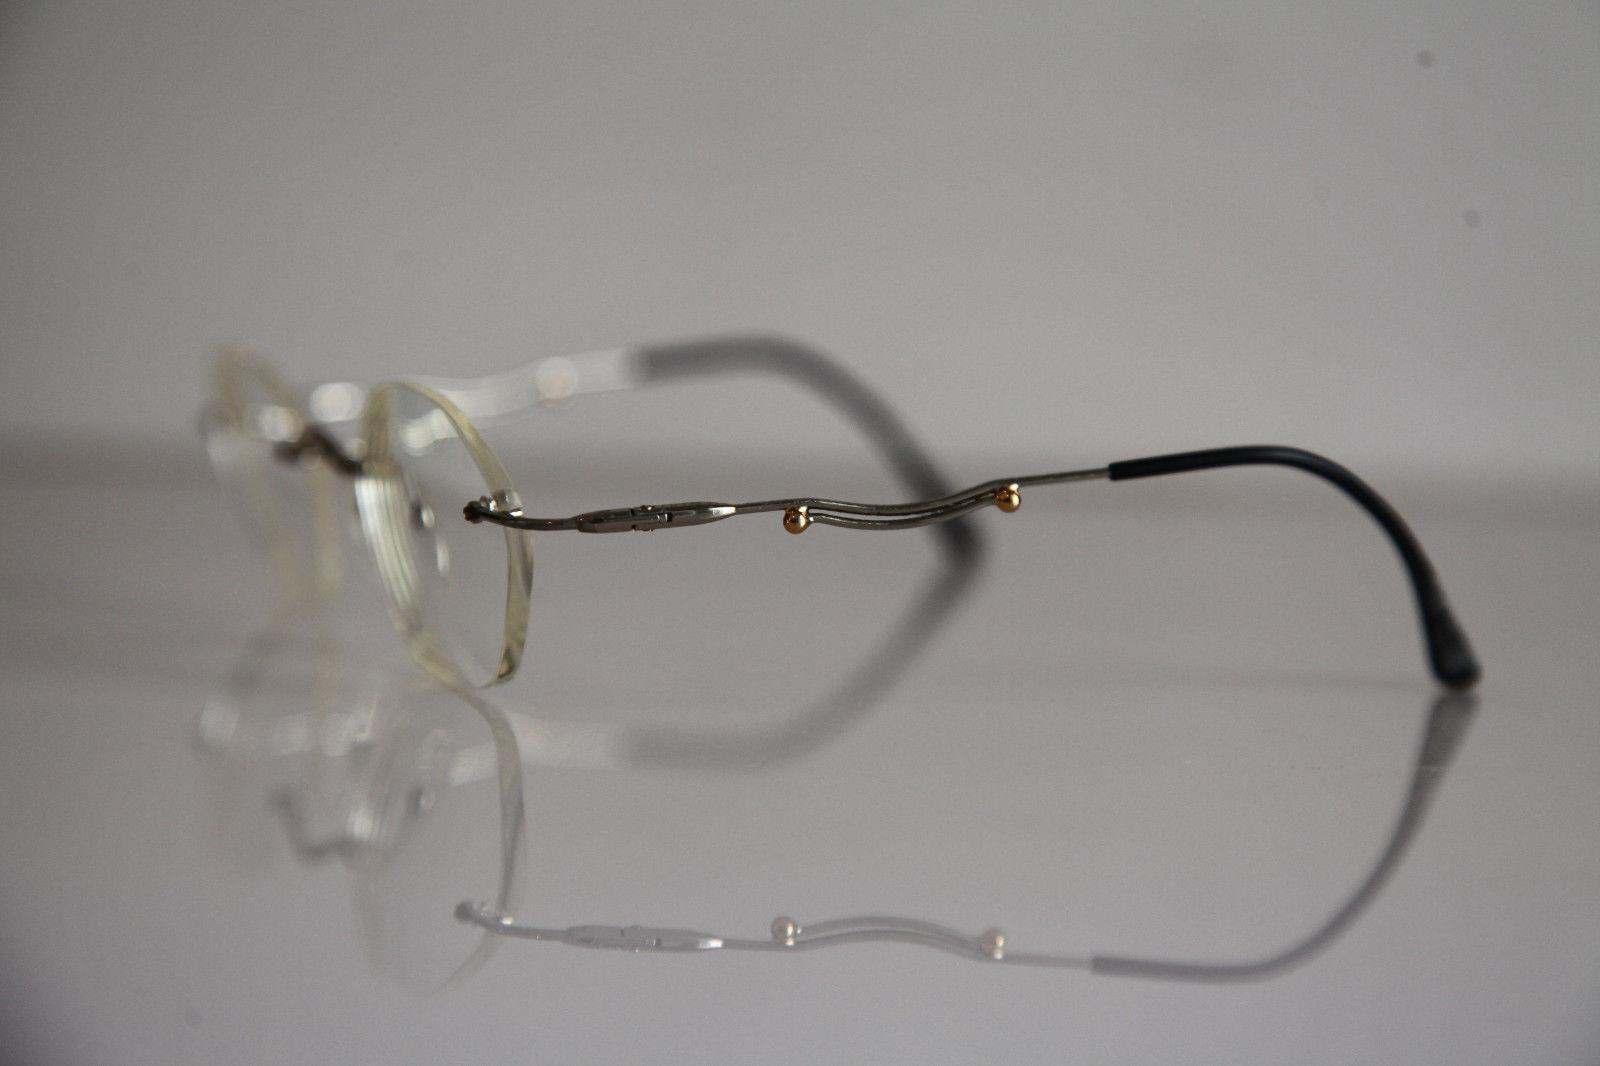 IGA OPTIC Eyewear,  Rimless Frame,  Chrome,  RX-Able Prescription Lenses.